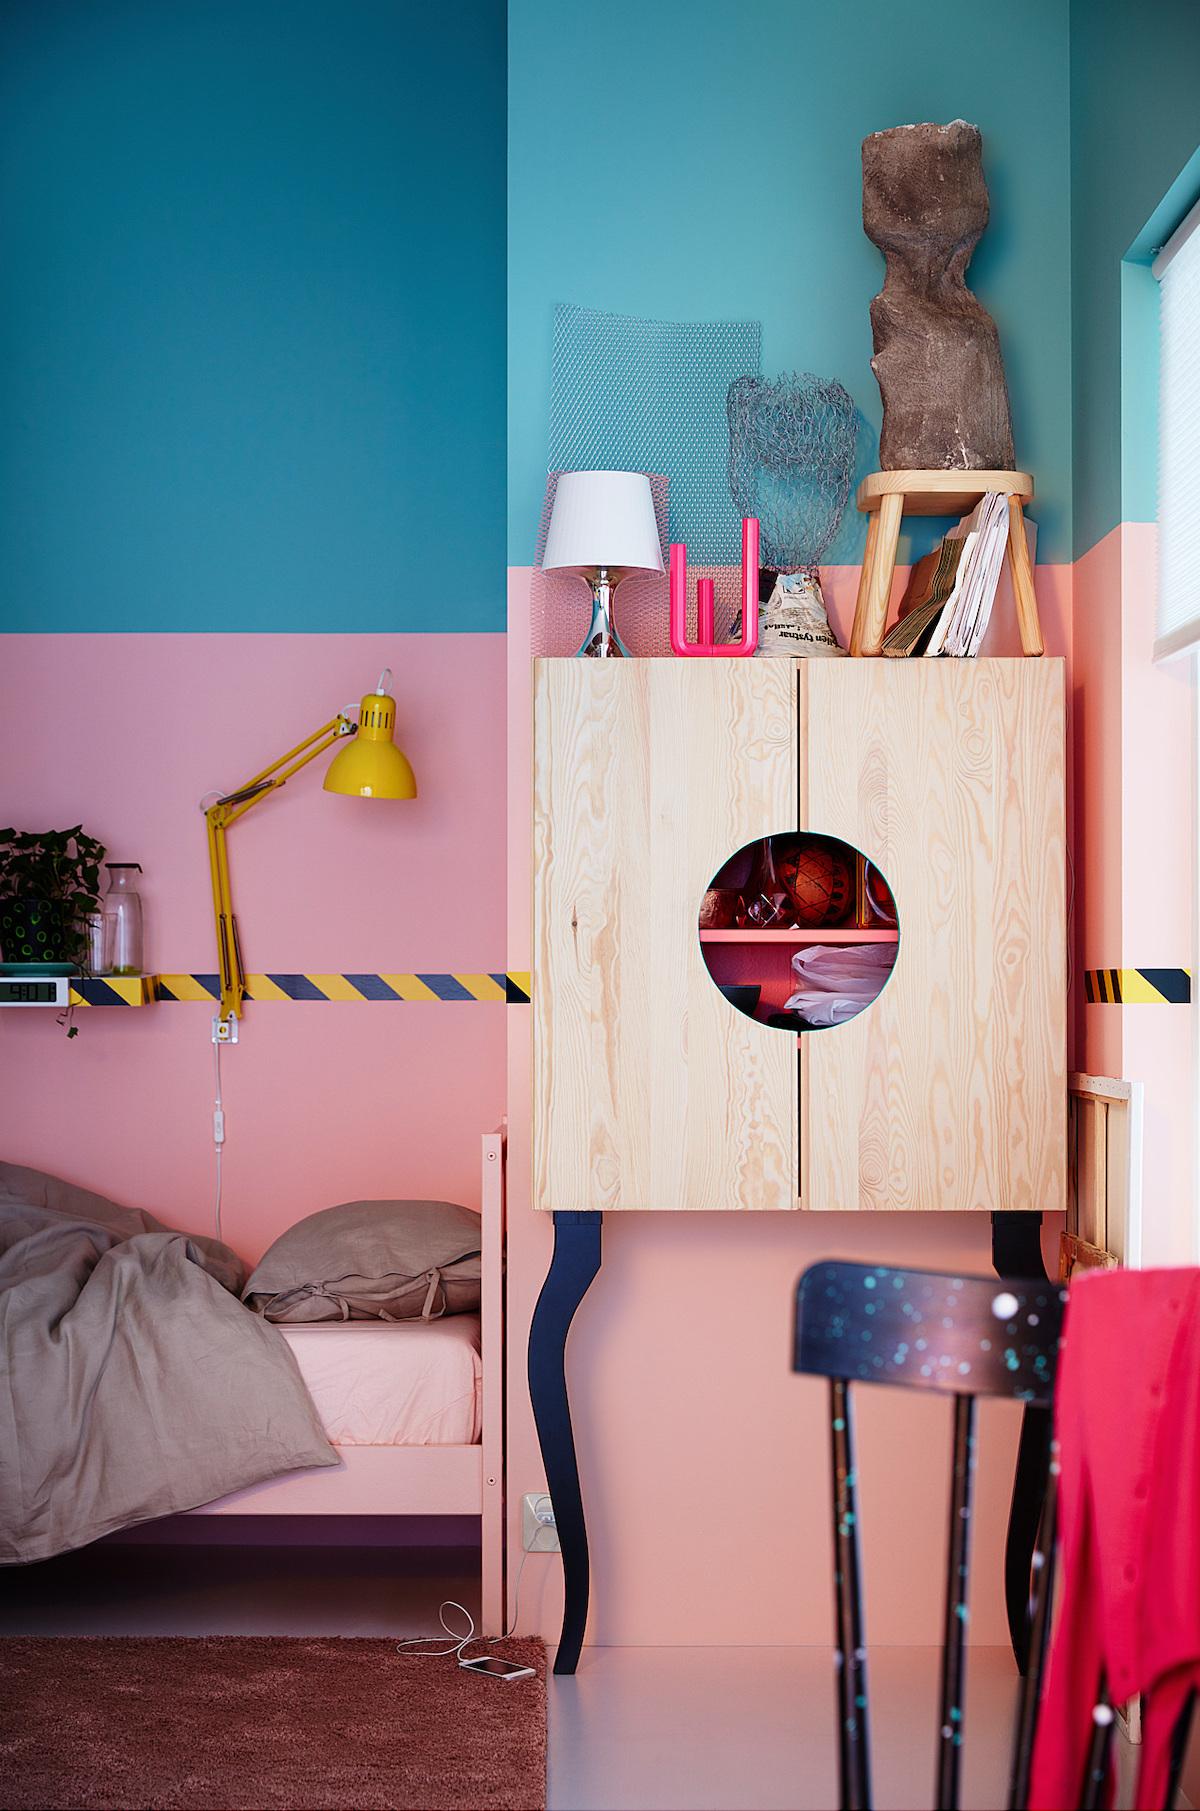 idée diy meuble bois pin fixé mur rose chambre blog déco clemaroundthecorner